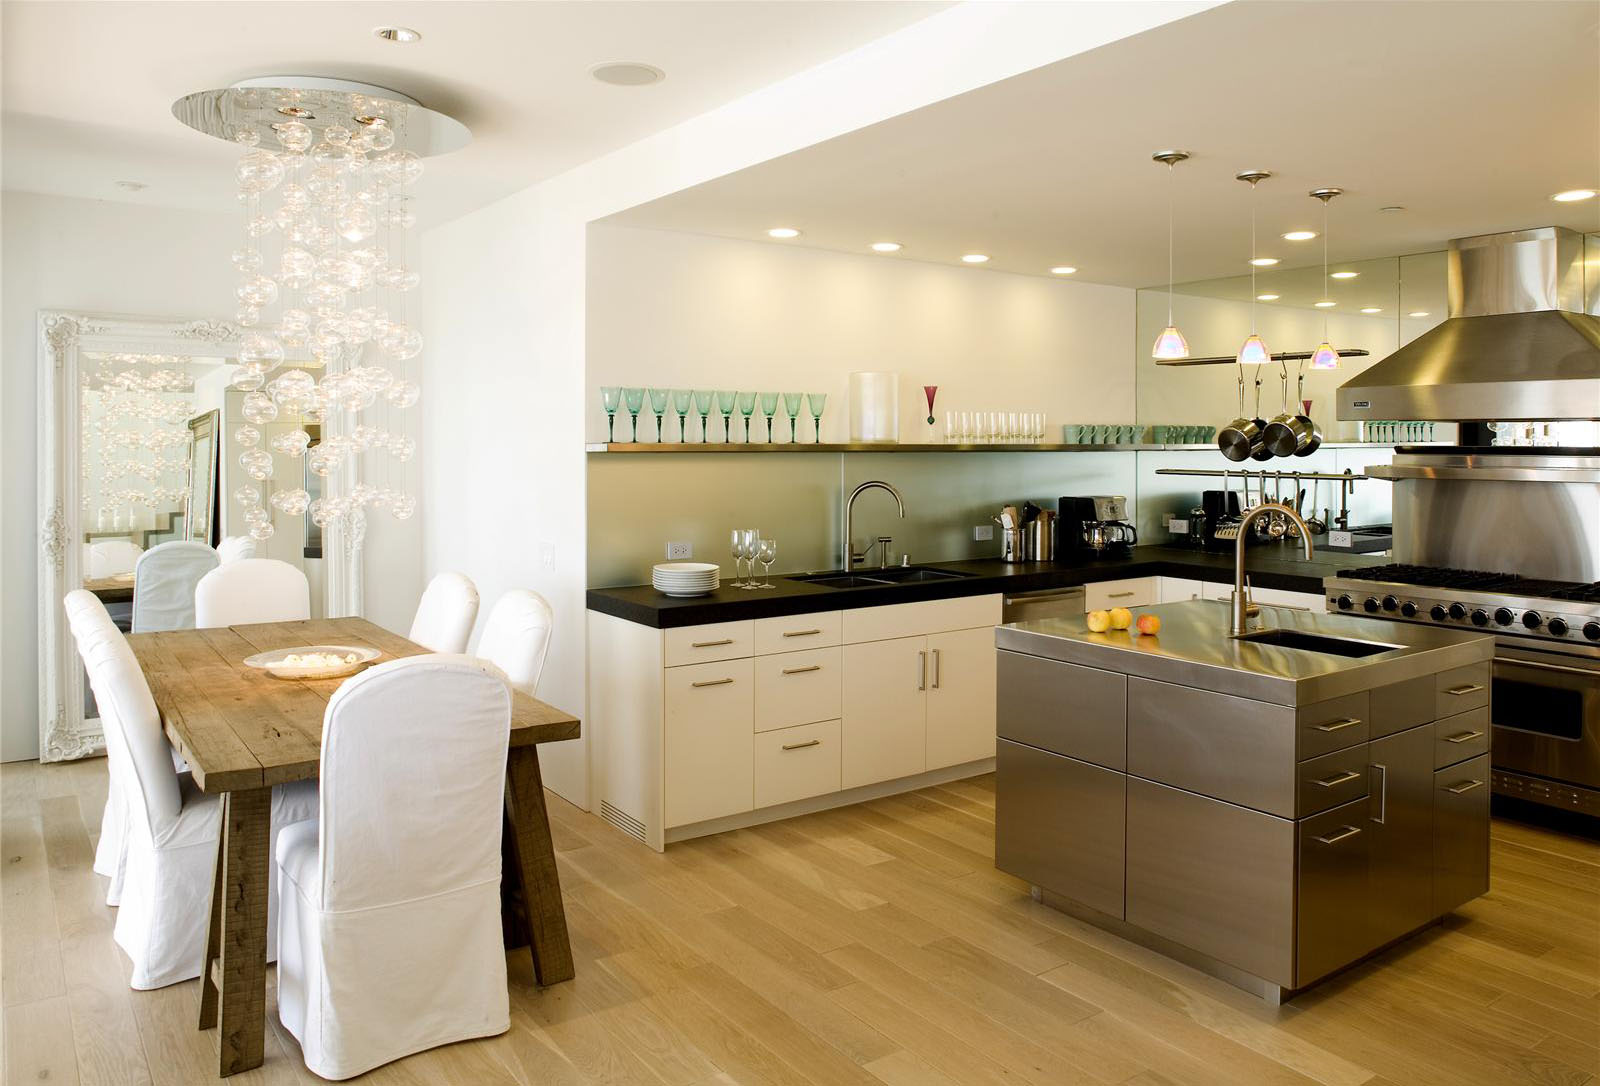 open contemporary kitchen design ideas kitchen design ideas Via Homeportfolio